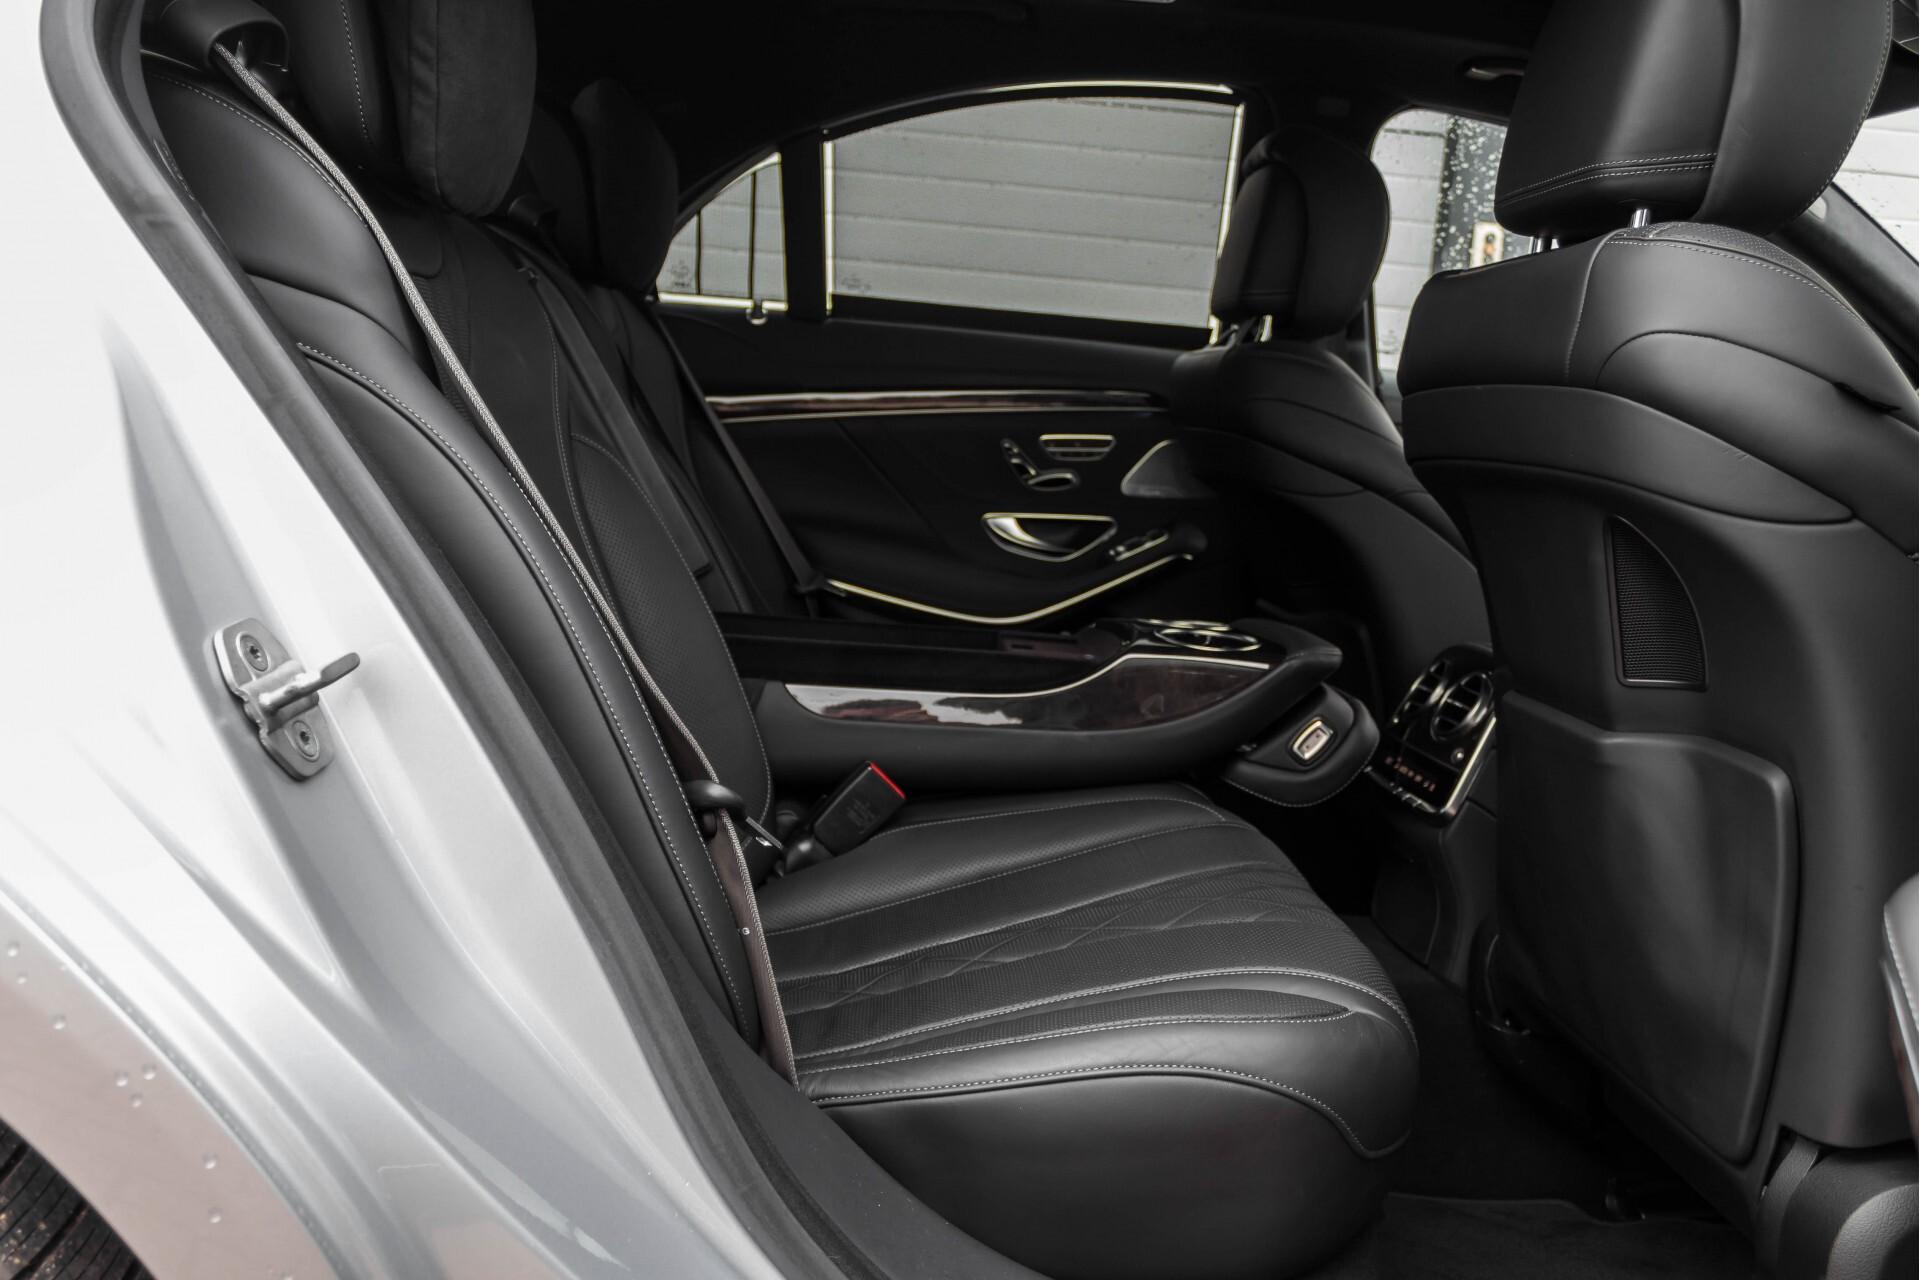 Mercedes-Benz S-Klasse 350 Bluetec Exclusive Panorama/Massage/Keyless/Distronic/Standkachel Aut7 Foto 5